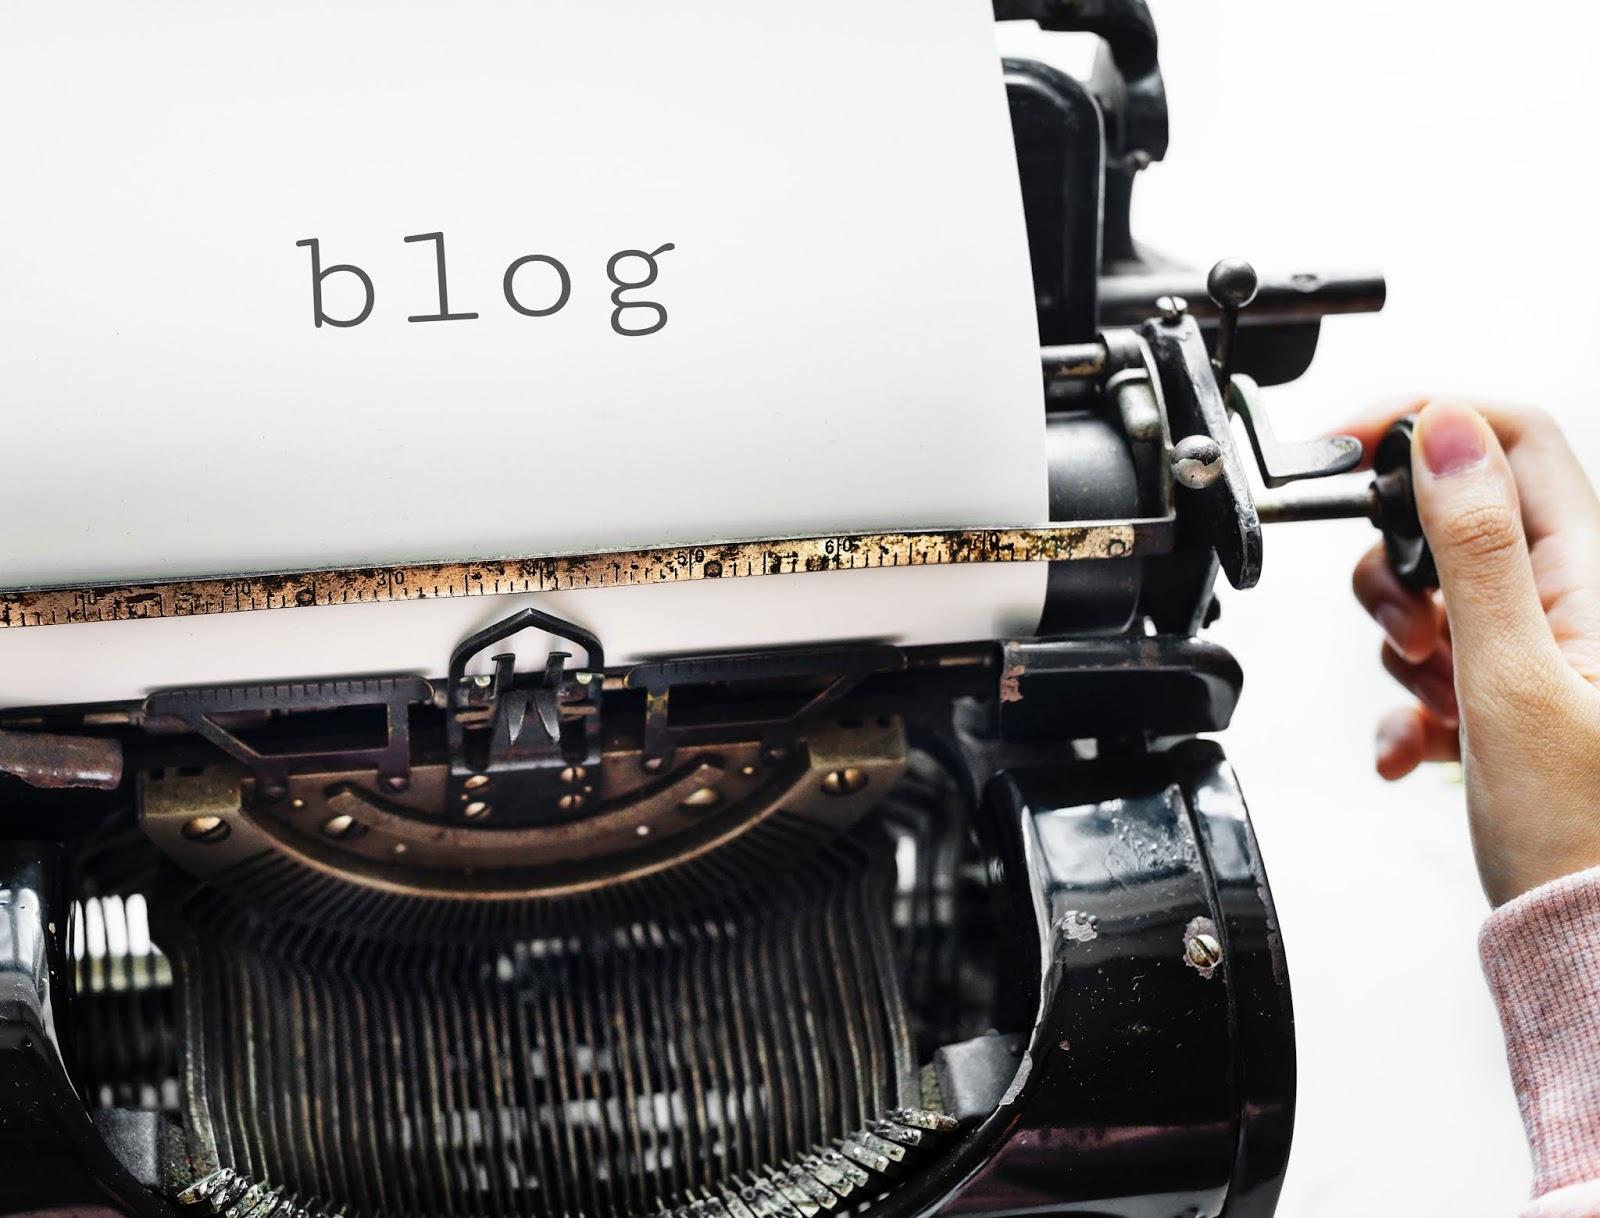 meta tag,meta tags,إضافة meta tag لمدونات بلوجر,بلوجر,إضافة ال meta tag إلى مواضيع بلوجر,meta tag blogger,دورة بلوجر,full seo meta tags,انشاء مدونة بلوجر,اكواد الميتا تاج,ميتا تاج بلوجر,ميتا تاج,meta,افضل اكواد meta tag,meta tags seo,كيفية اضافة اكواد الميتا تاج